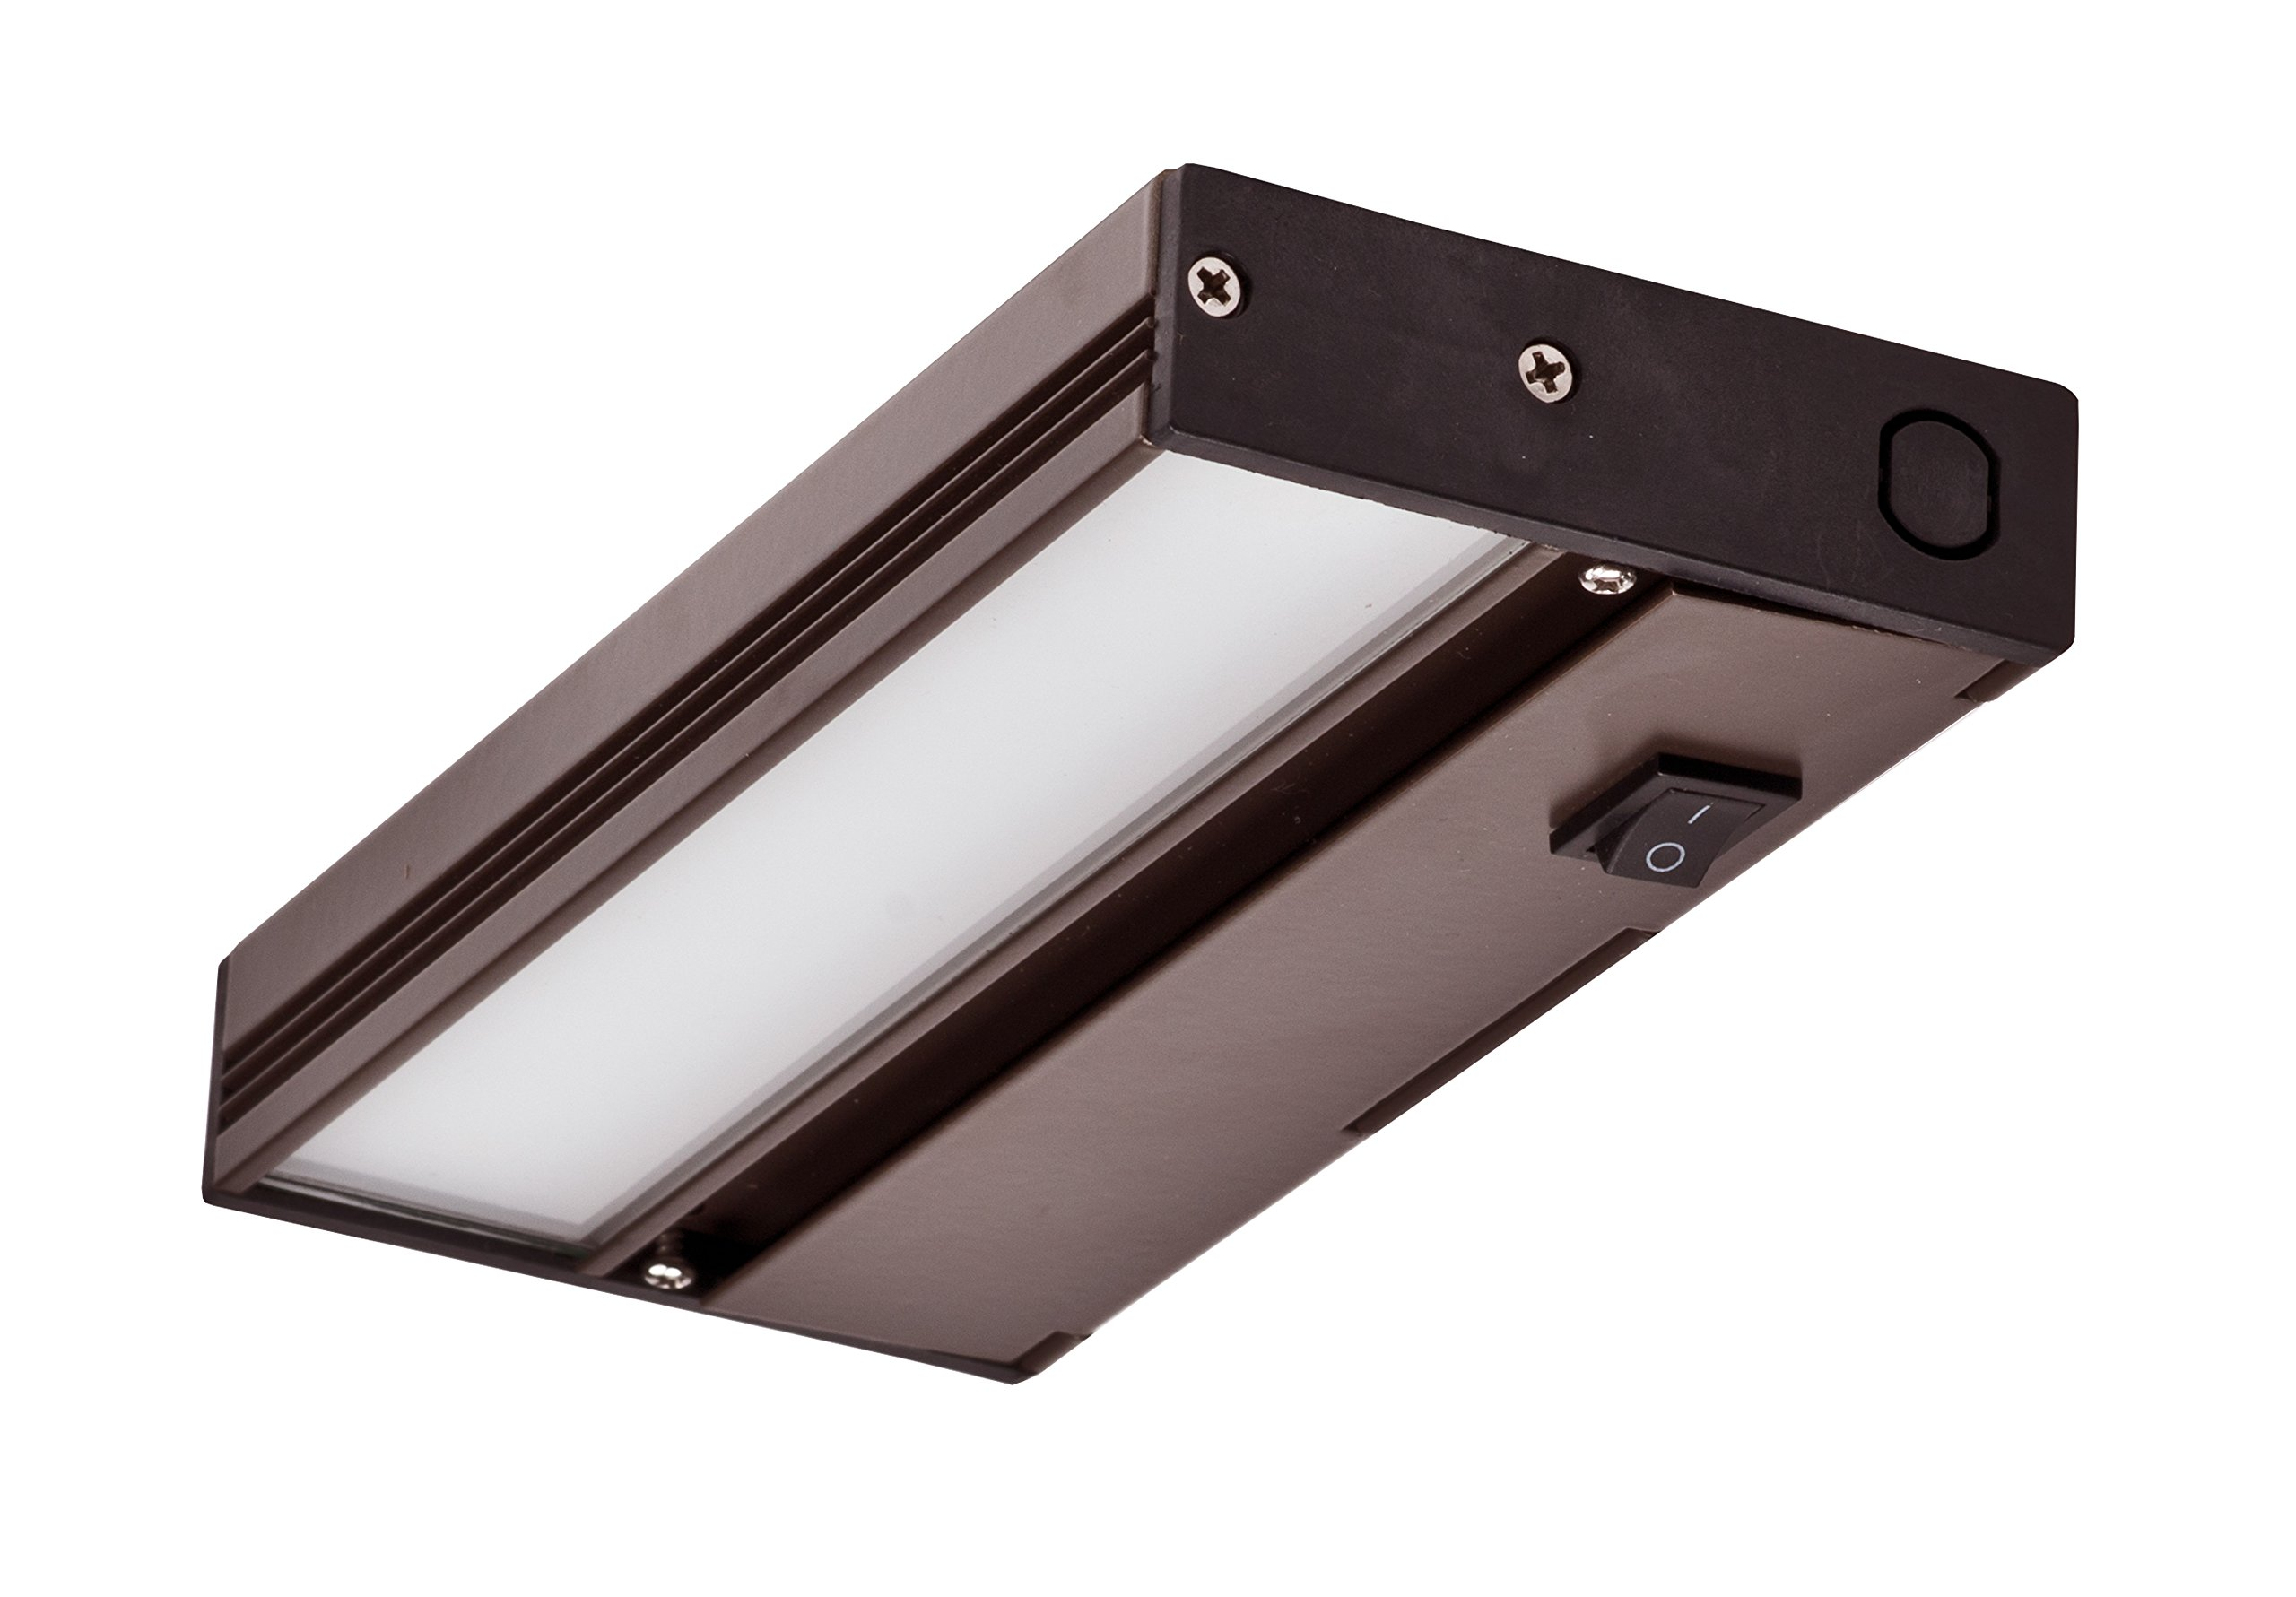 NICOR Lighting 8-Inch Slim Dimmable 2700K LED Under Cabinet Light Fixture, Oil-Rubbed Bronze (NUC-4-08-DM-W-OB)